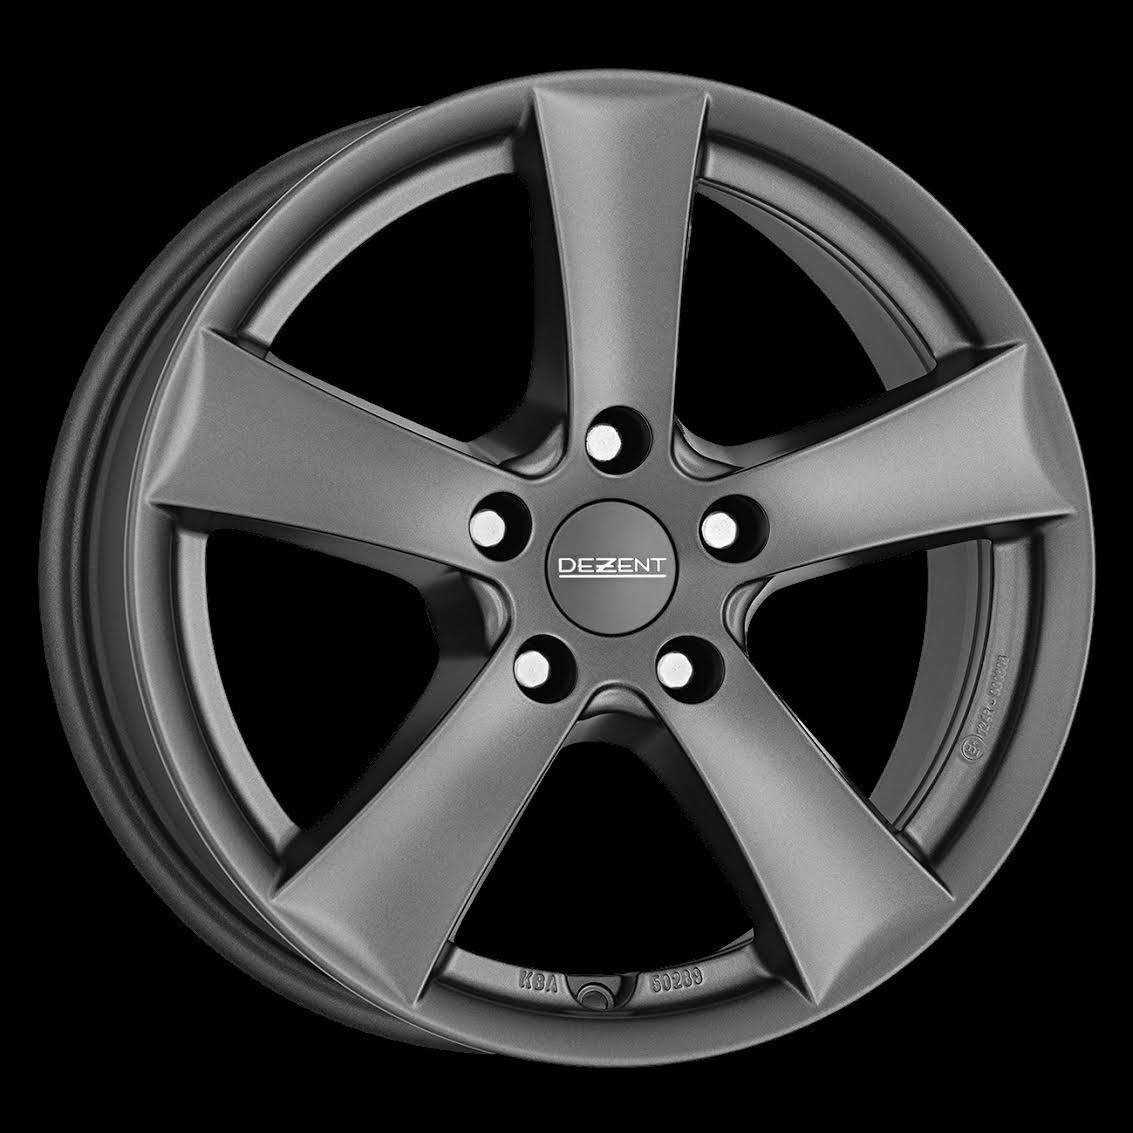 dezent wheels autocenter de rudder banden velgen en. Black Bedroom Furniture Sets. Home Design Ideas